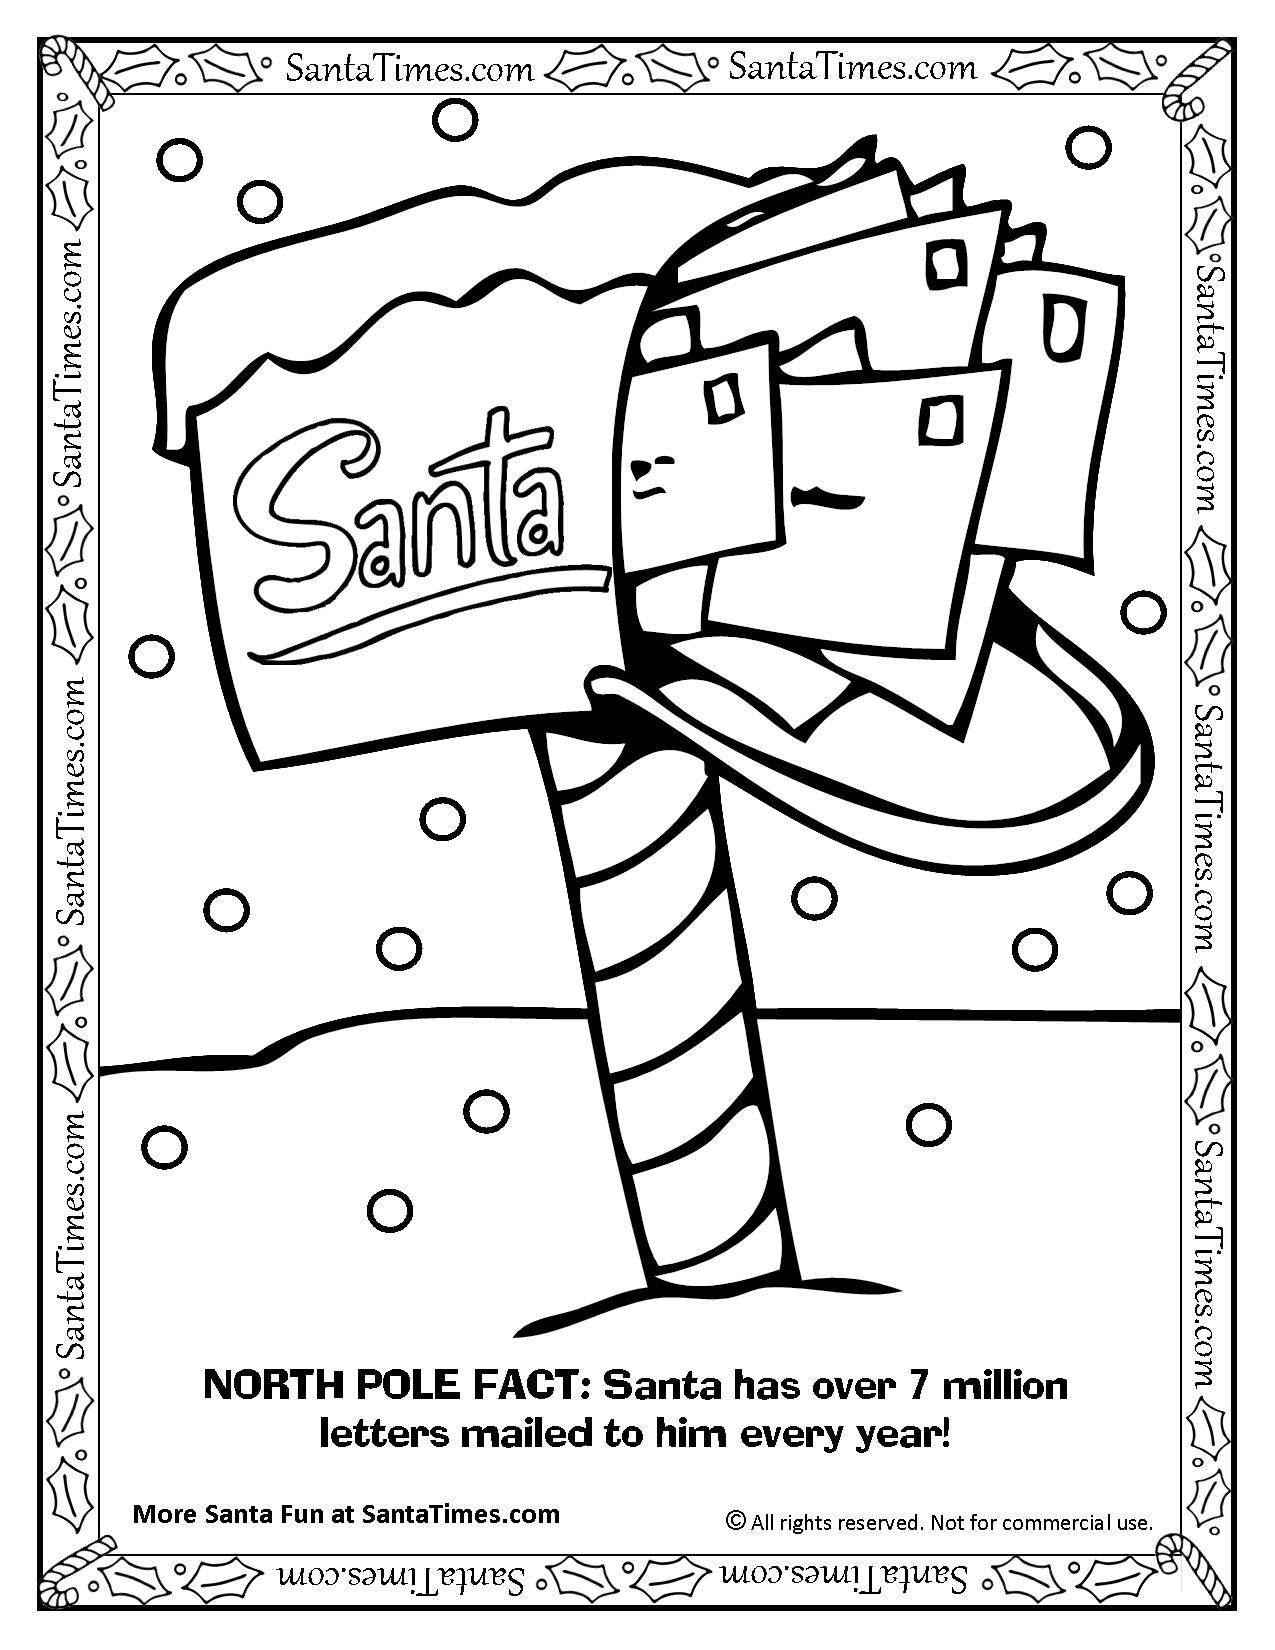 1275x1650 Santa's North Pole Mailbox Coloring Page Printout. More Fun